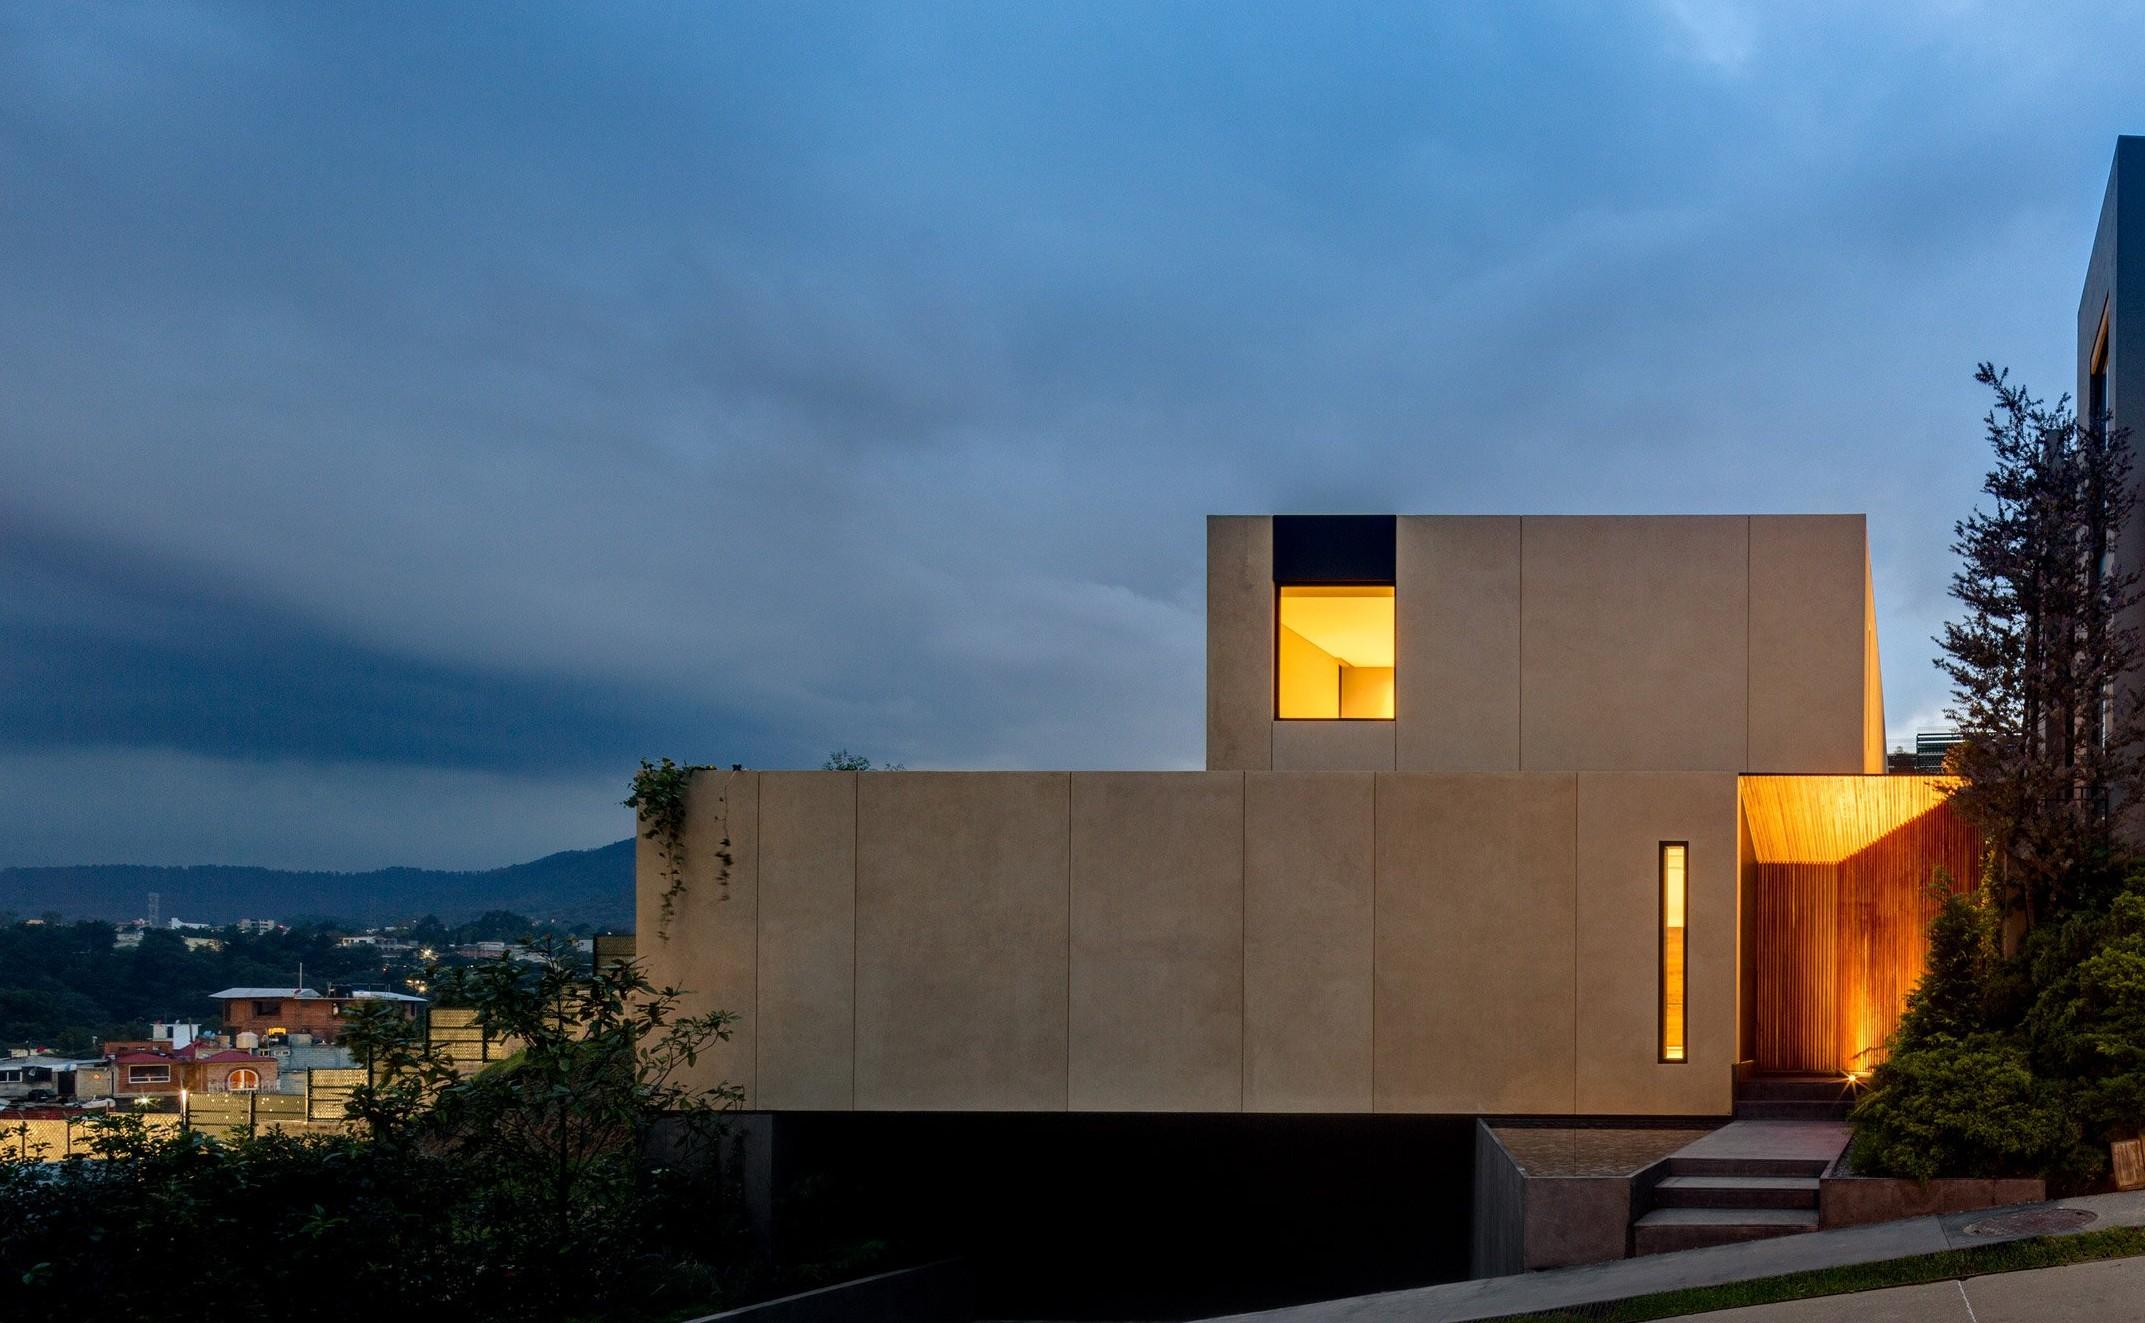 cumbres-house-arquitectura-sergio-portill_dezeen_2364_col_24